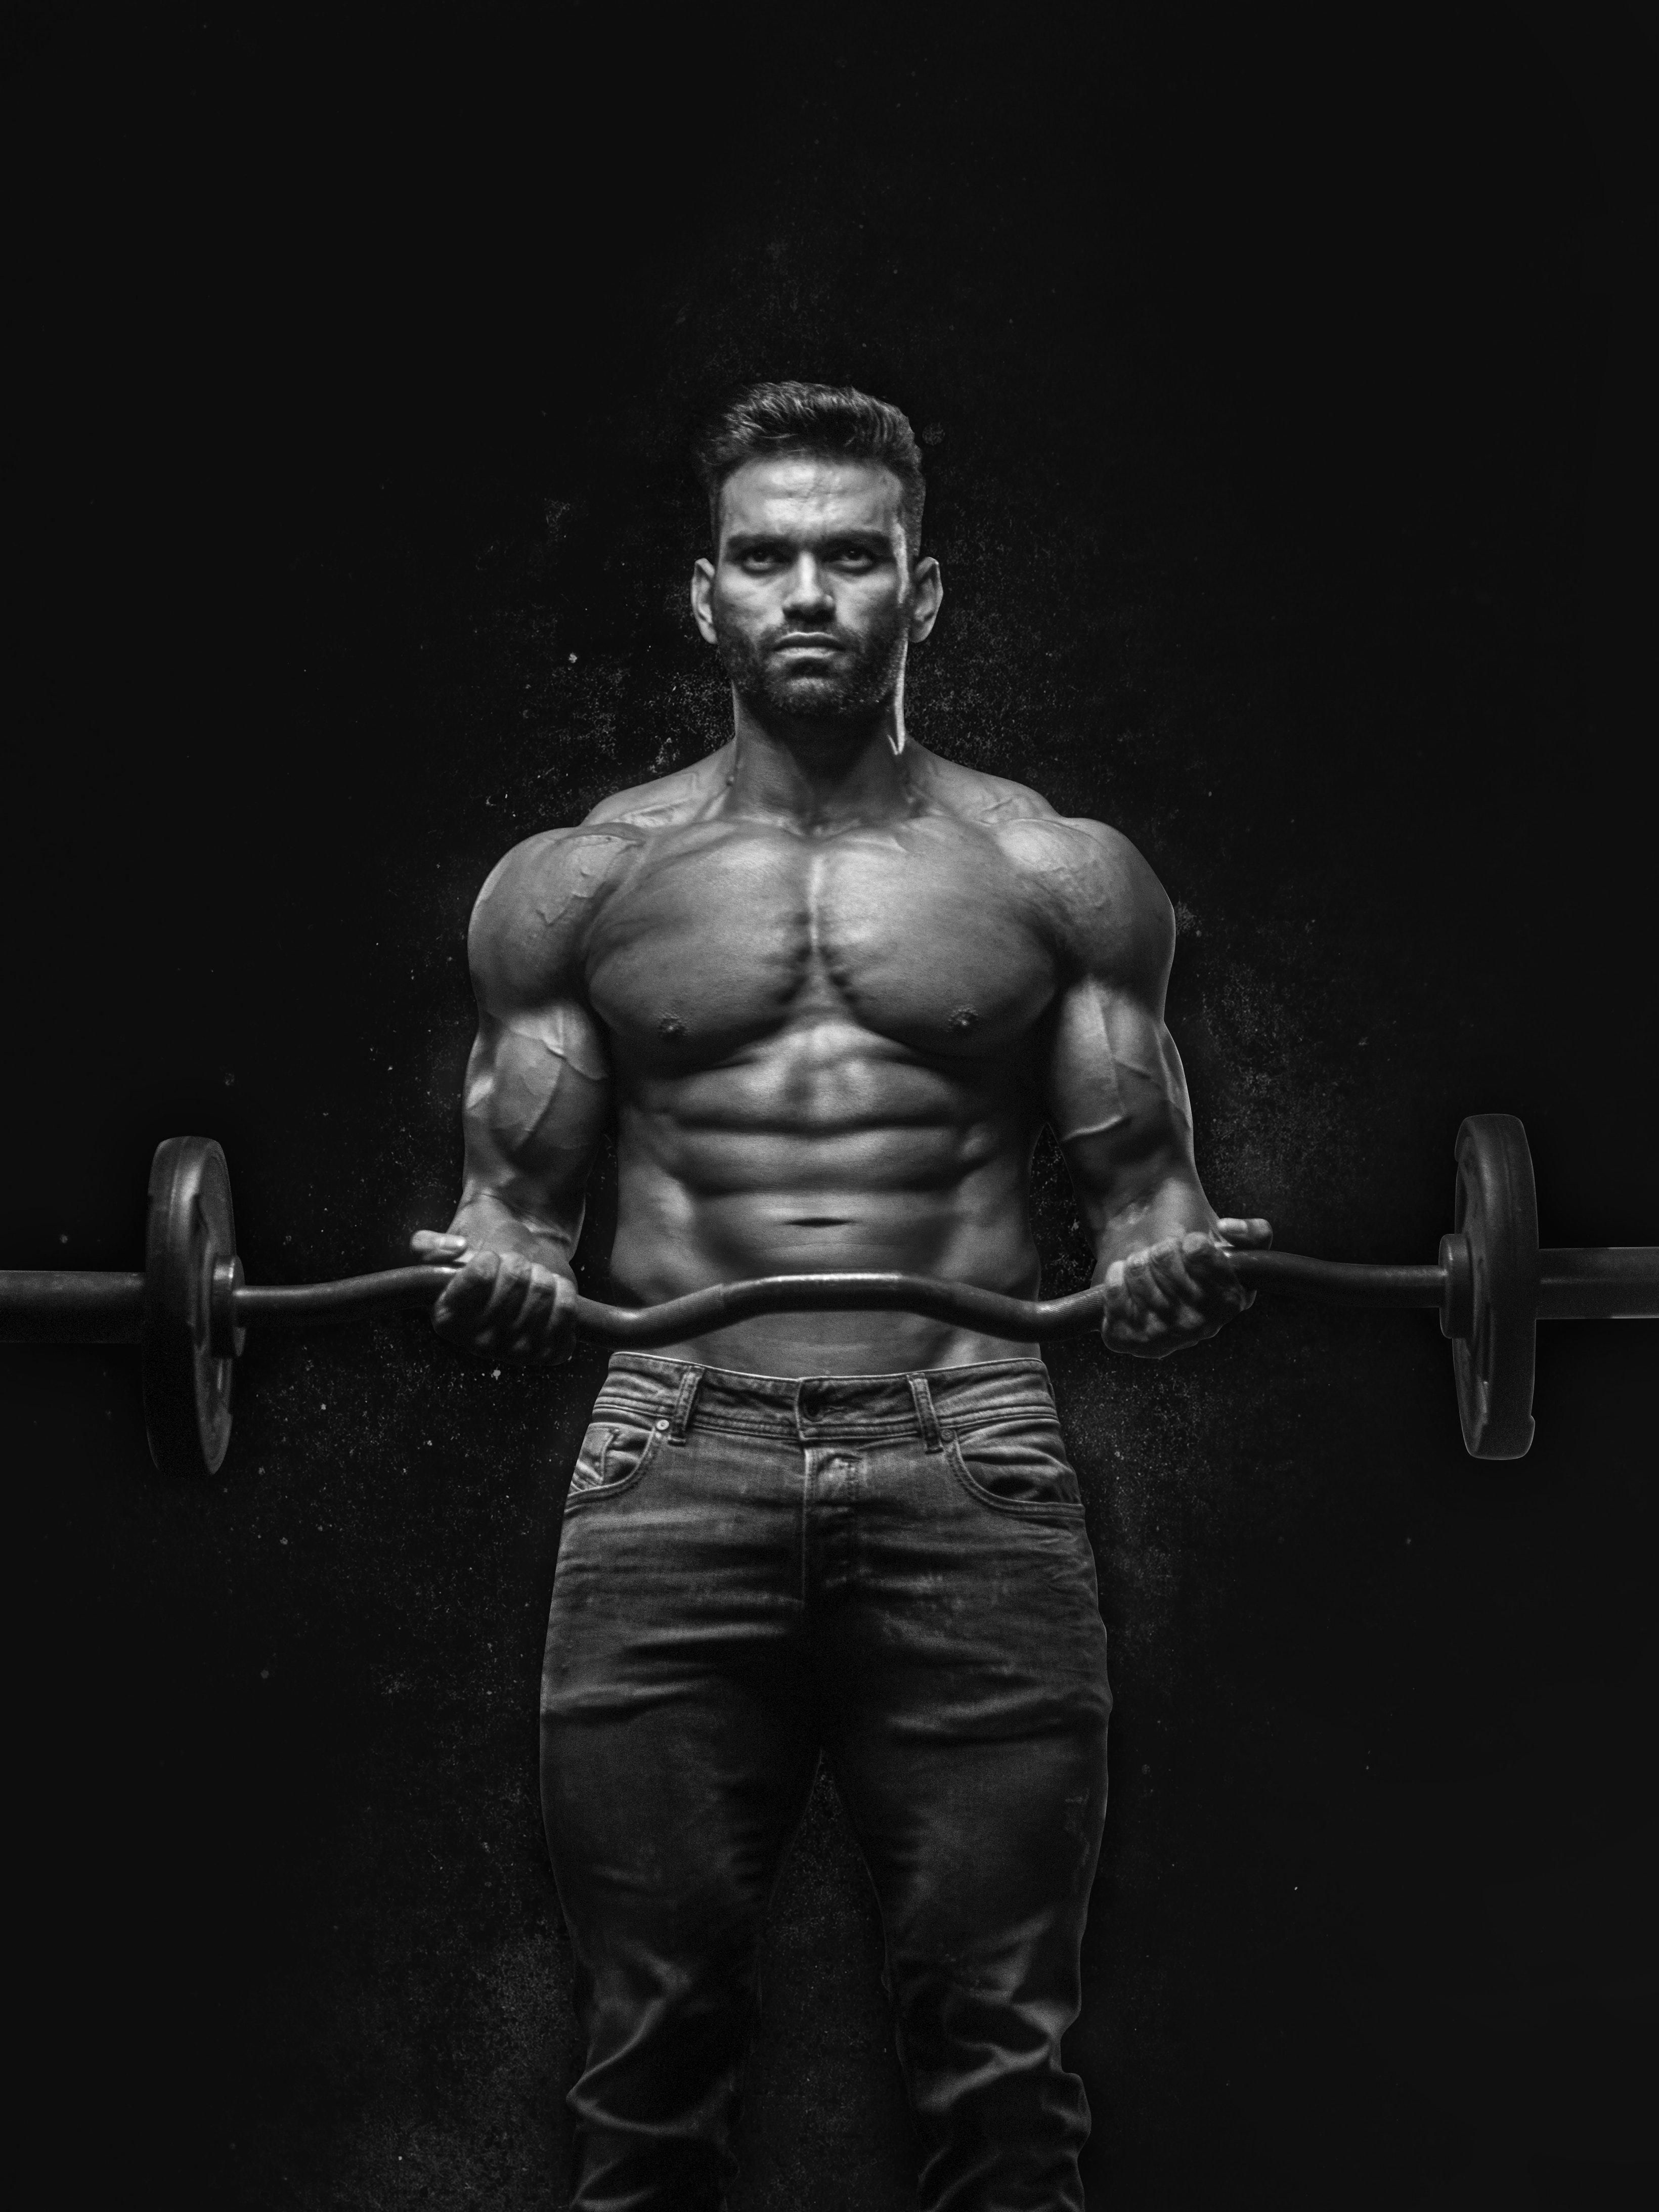 abs-active-athlete-1431282(1)